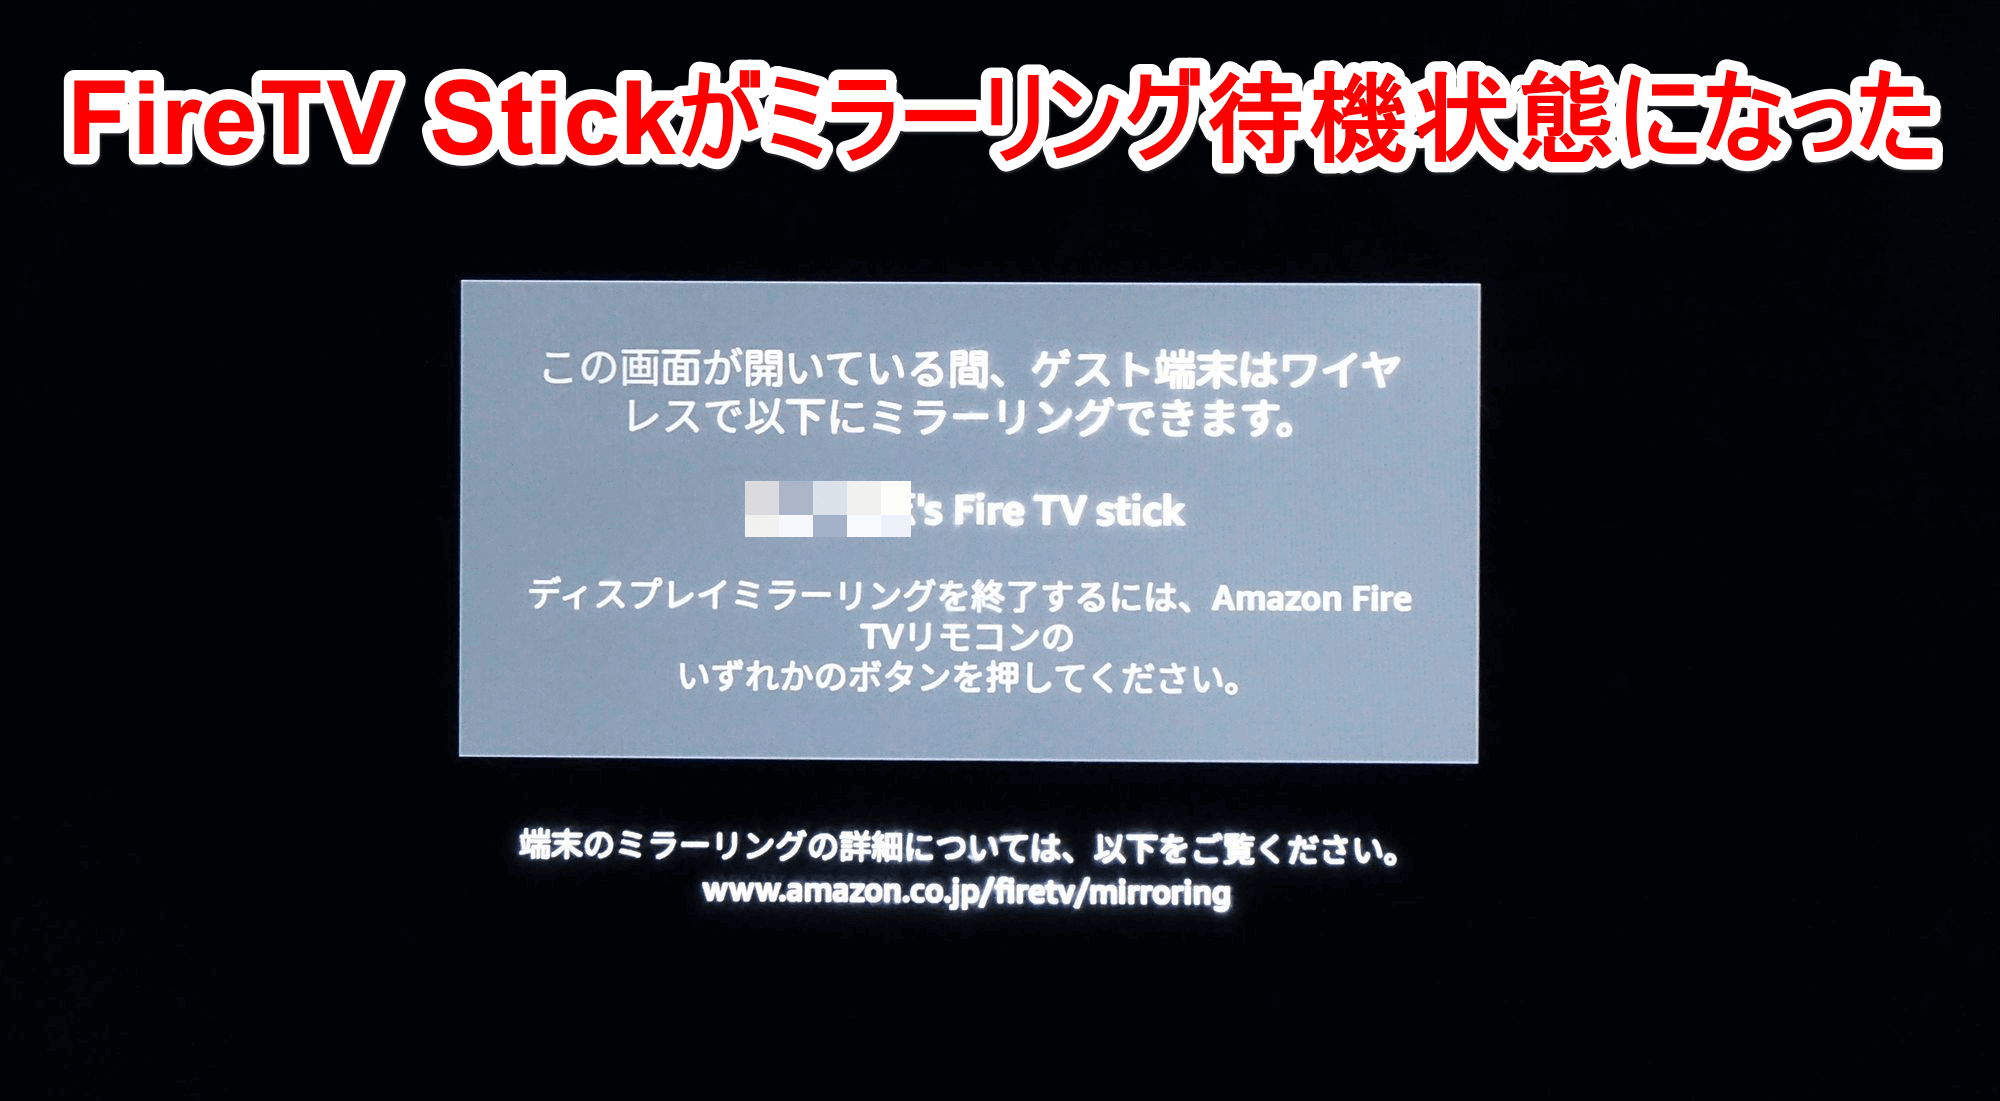 Kindle(キンドル)Fire TV Stick(スティック)のホーム画面(待機状態)